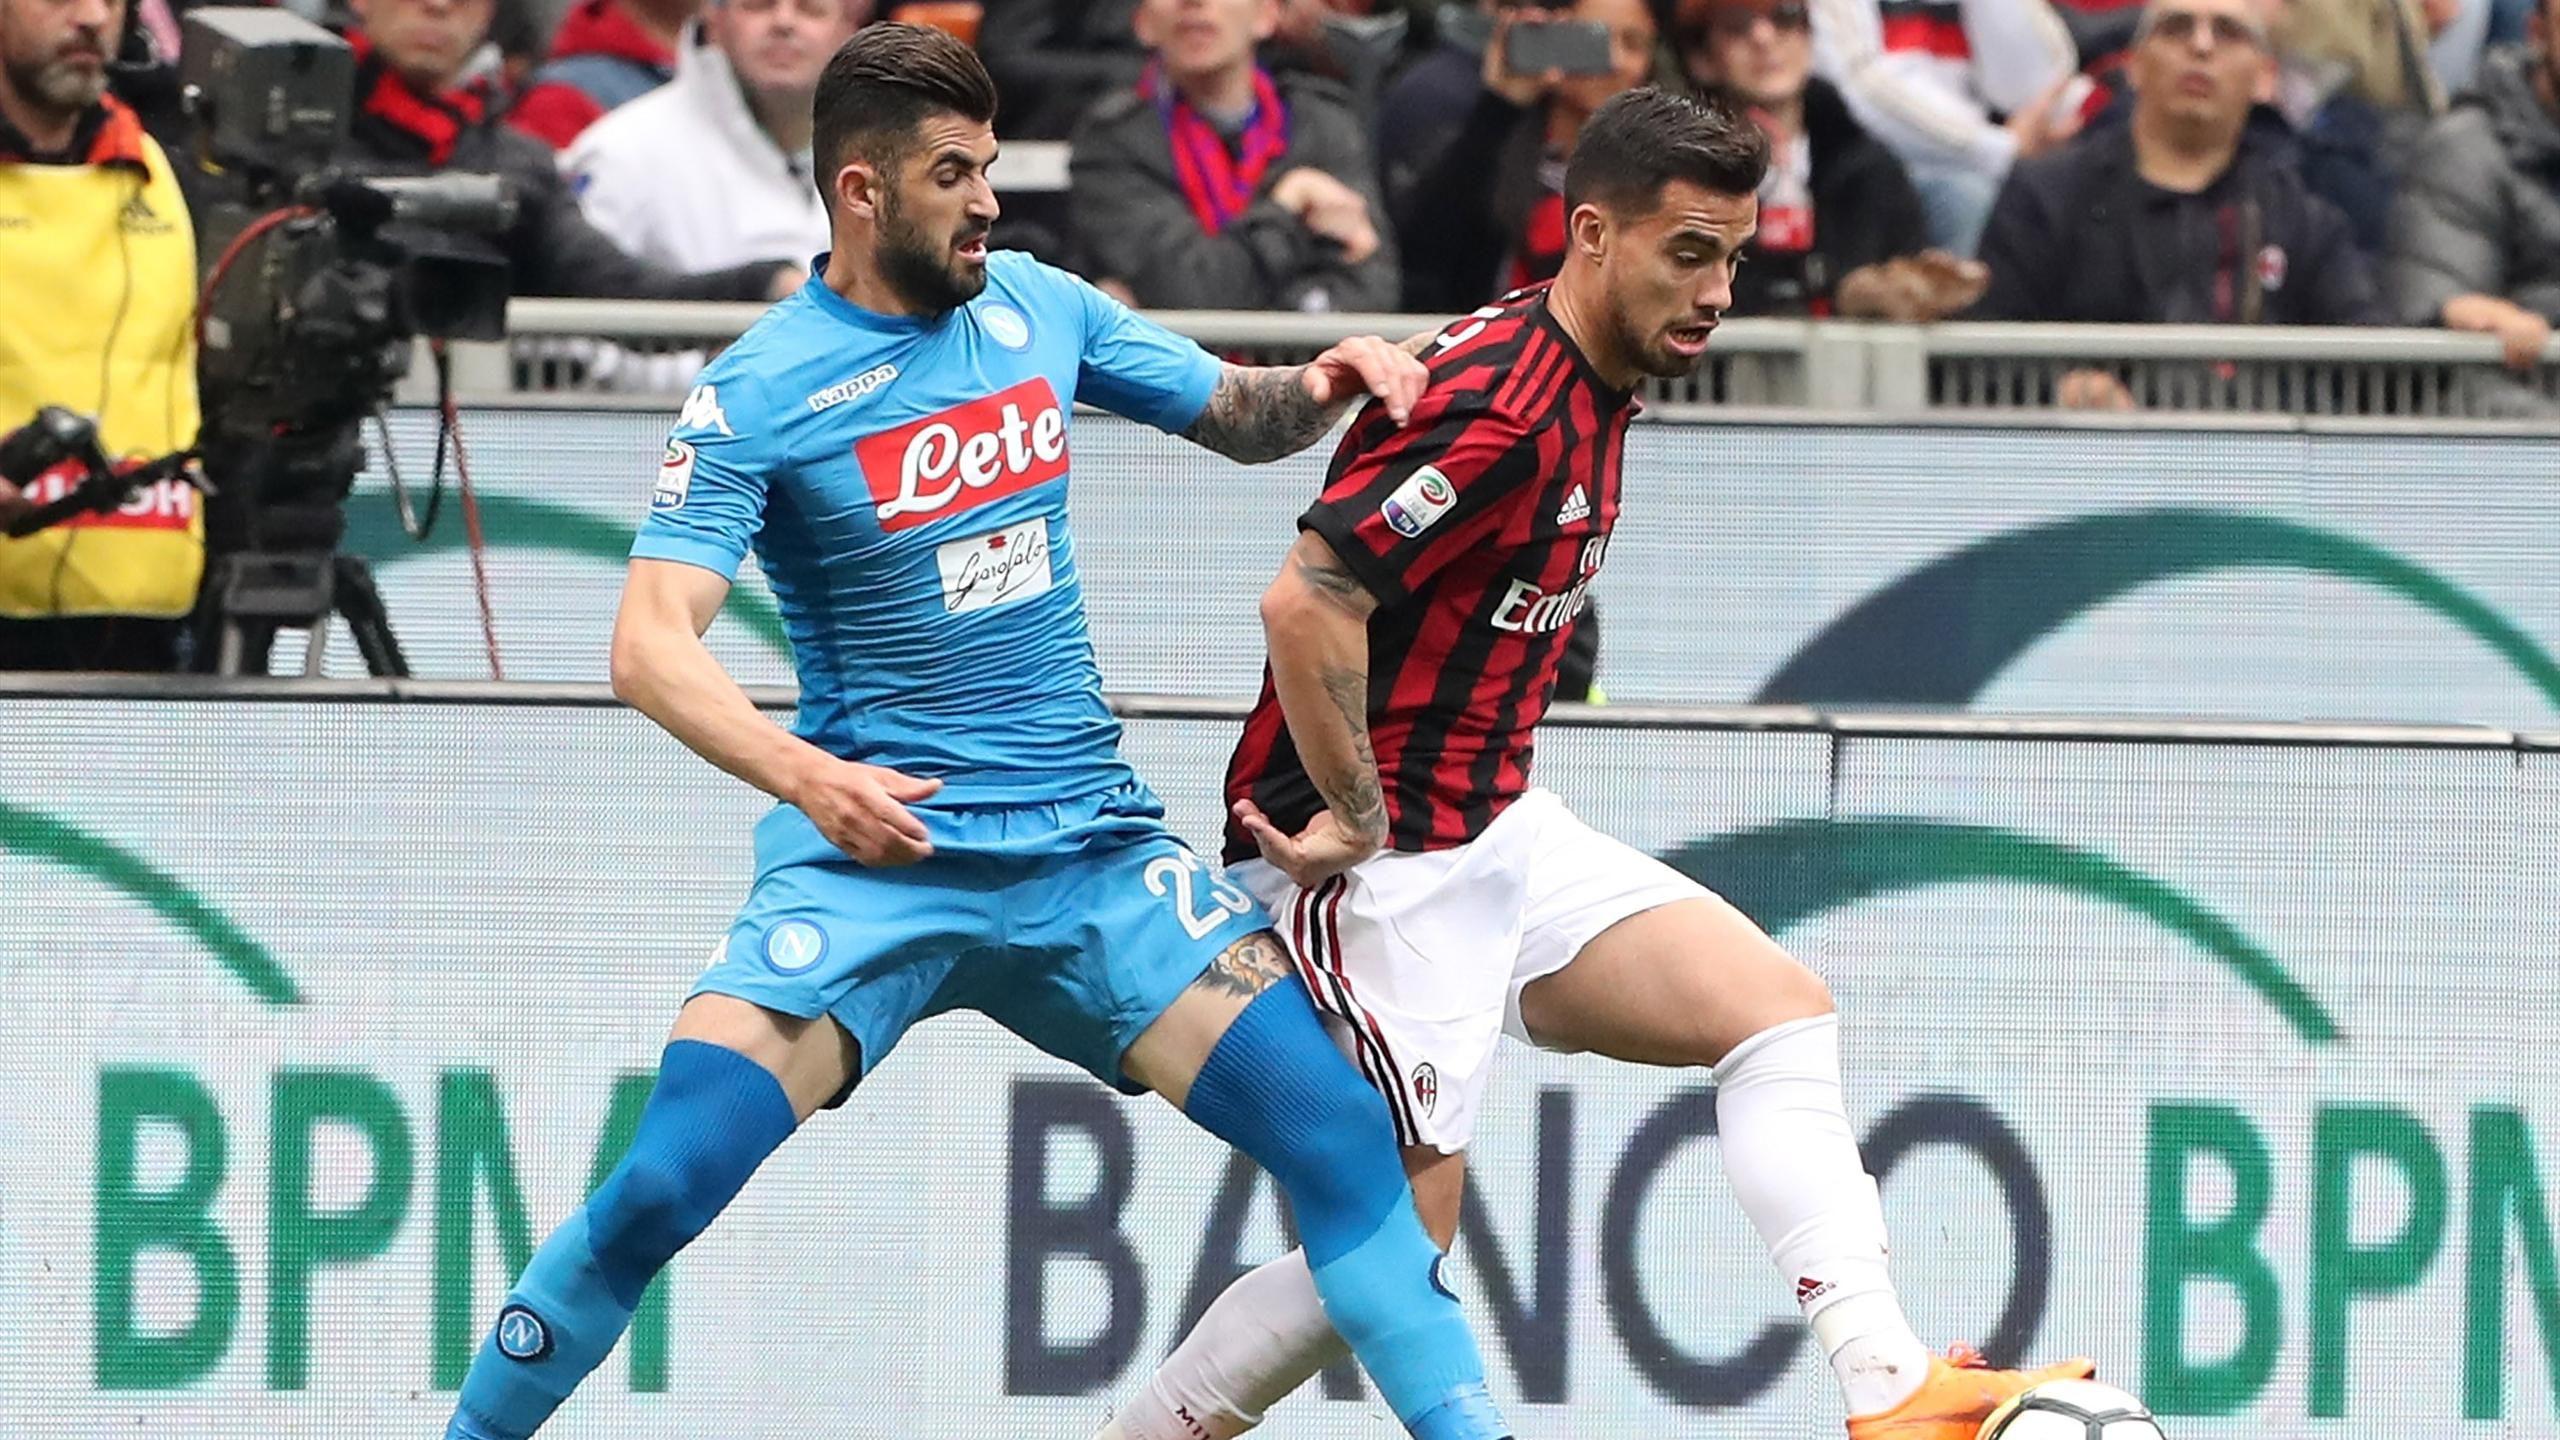 "Seria A/ Juve i arratiset Napolit, Beneventos i ""zhduket"" Memushaj"